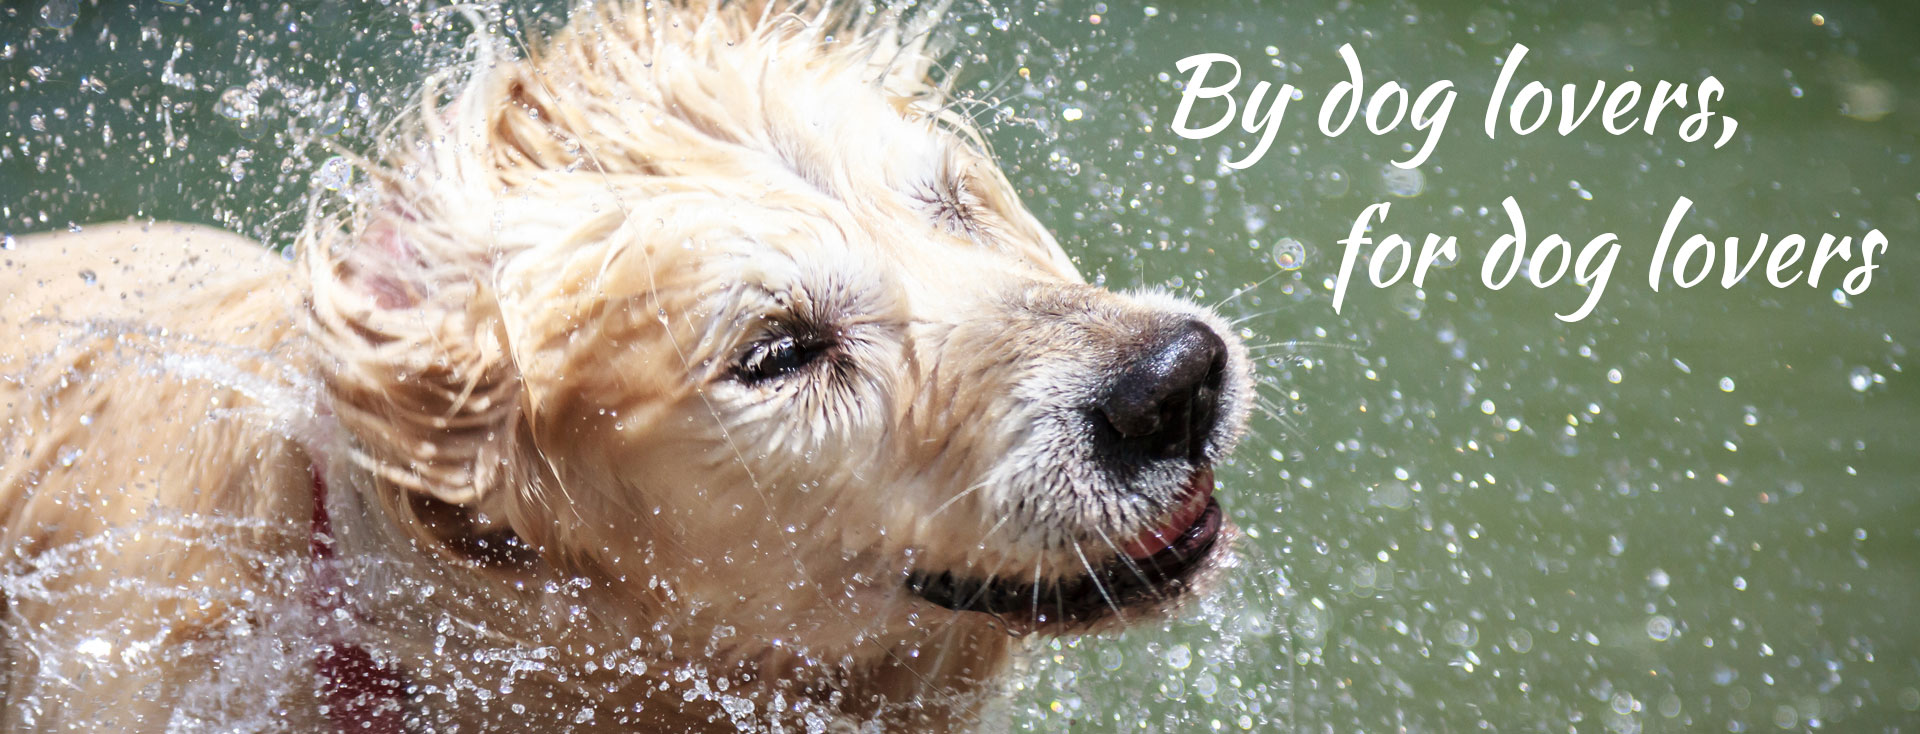 Organic diy dog wash brunswick dooba diy dog wash dooba dog wash melbourne diy solutioingenieria Choice Image